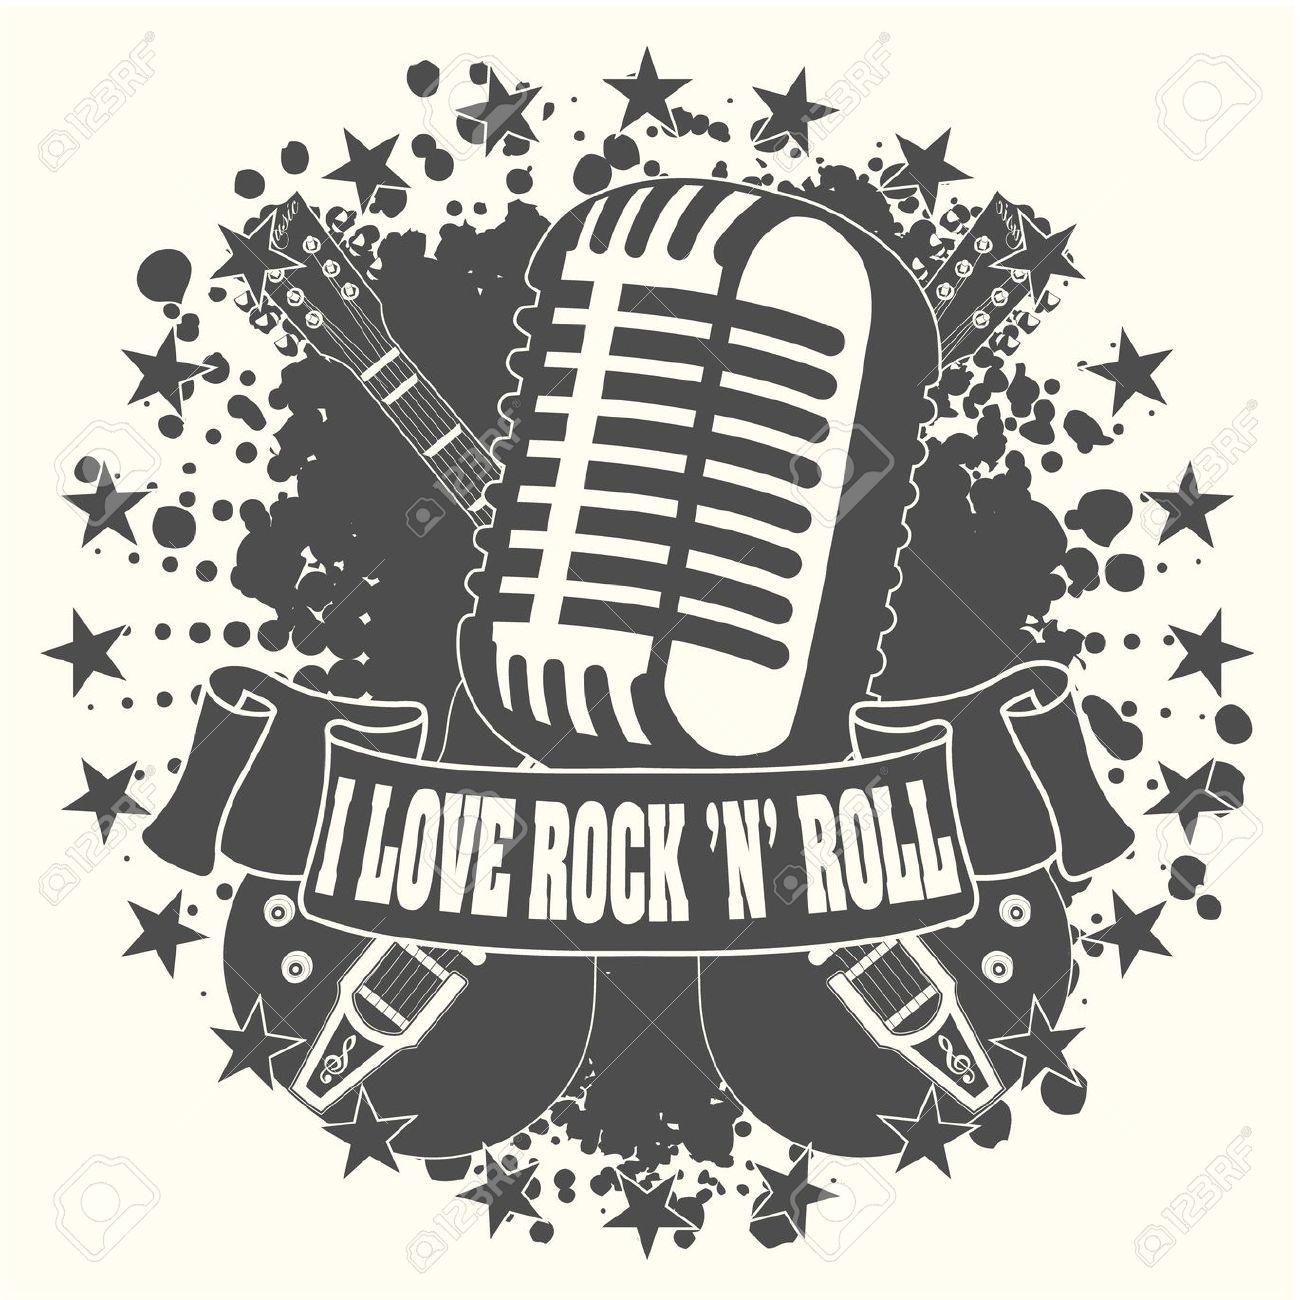 Rock n roll google search logo de rockeros pinterest rock illustration of the image symbol i love a rock n roll vector art clipart and stock vectors buycottarizona